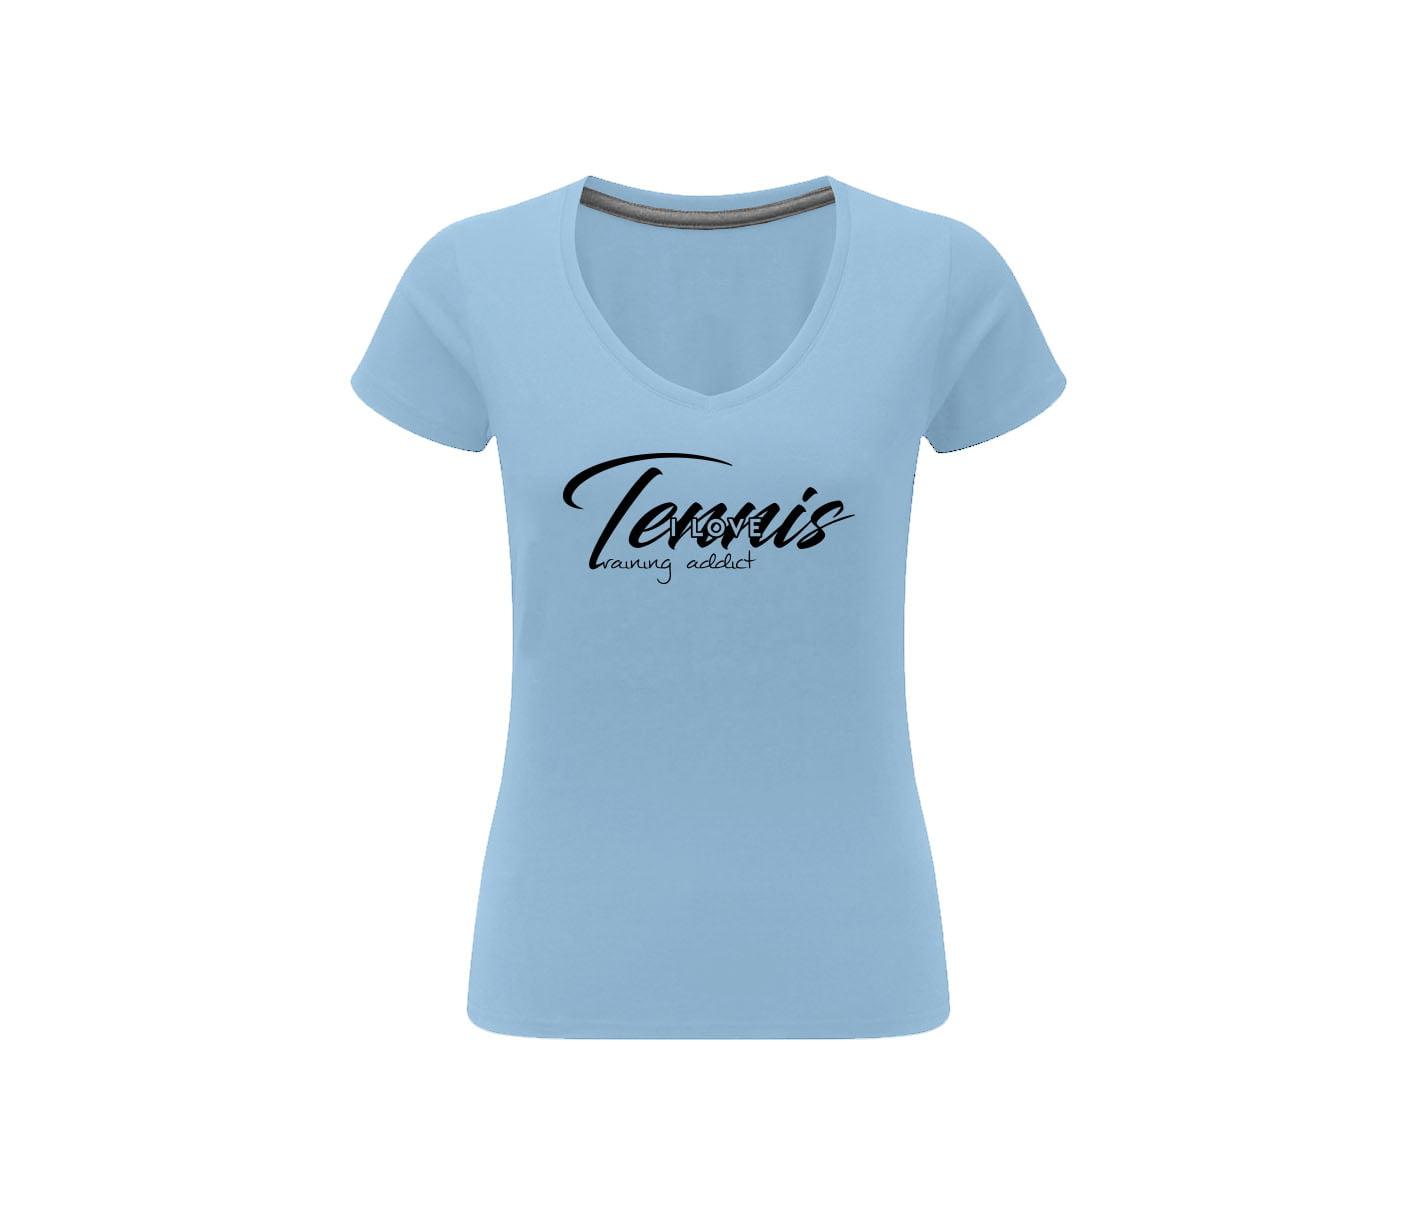 t shirt coton sober i love tennis training addict shop. Black Bedroom Furniture Sets. Home Design Ideas